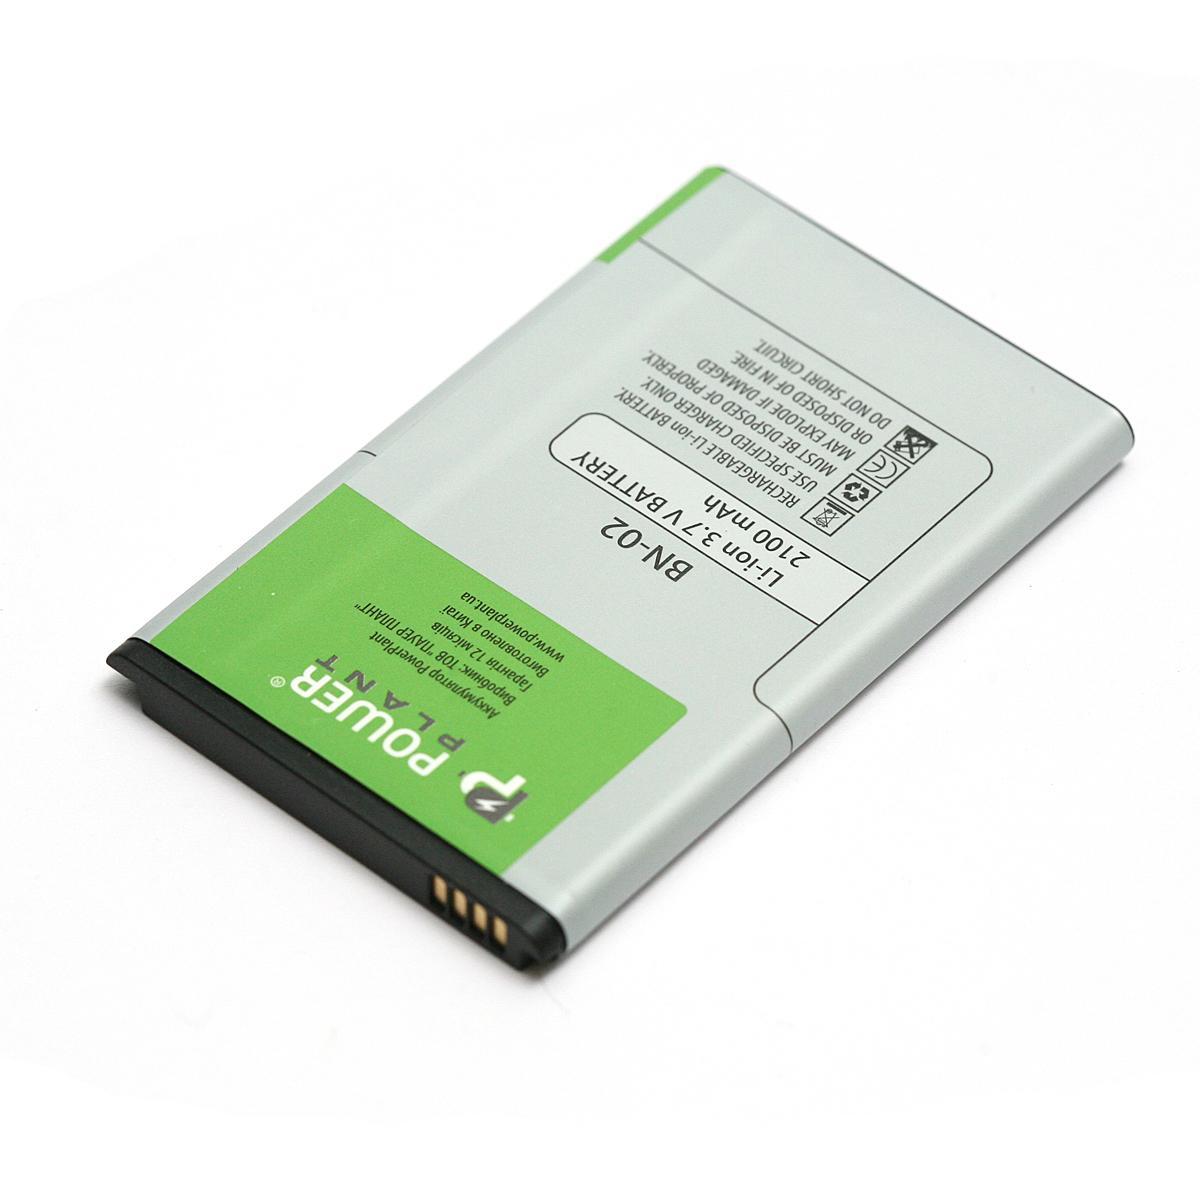 Купить Аккумулятор PowerPlant Nokia XL (BN-02) 2100mAh